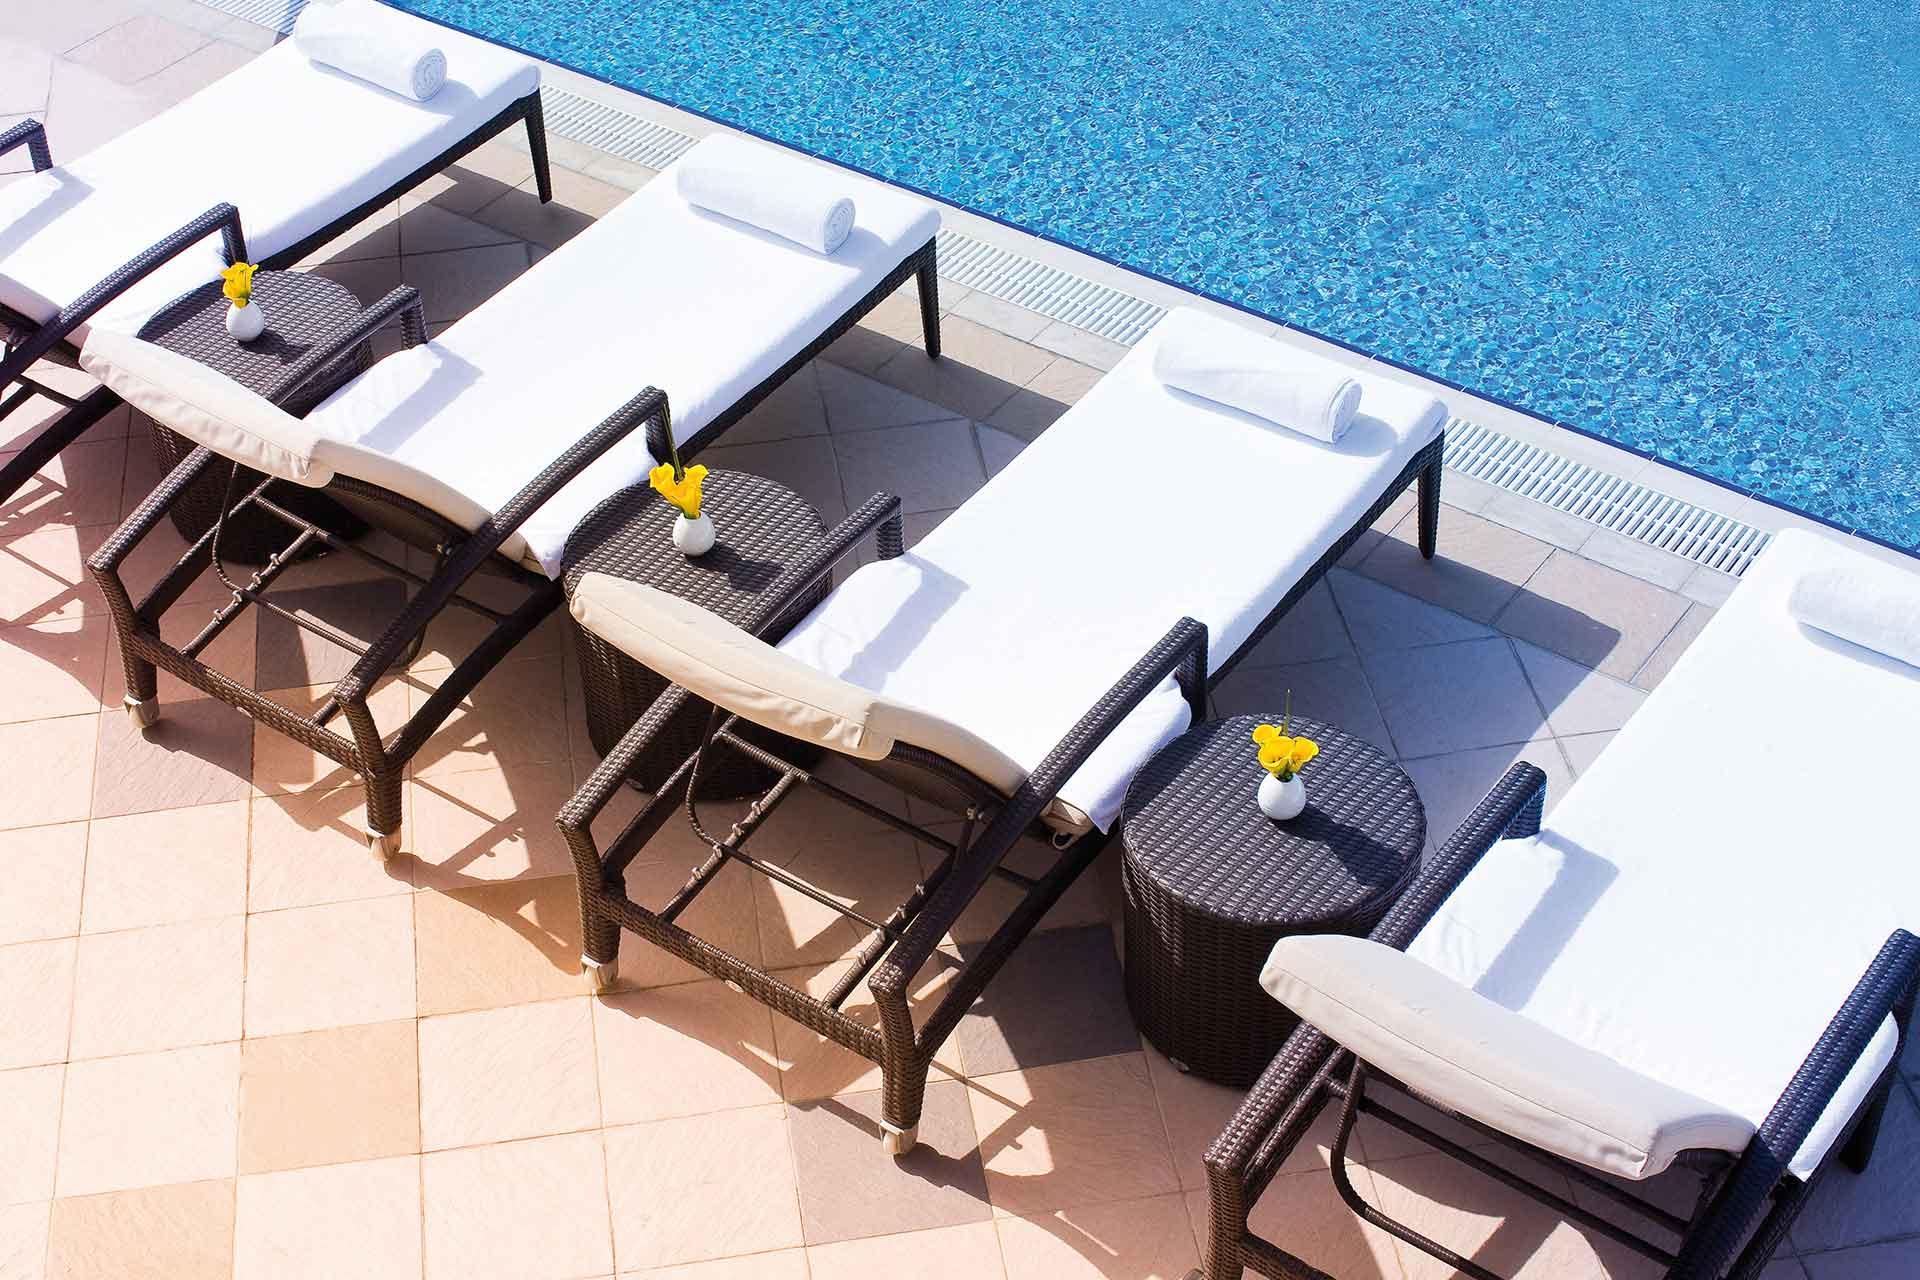 AVANI Deira Dubai Hotel Pool area view